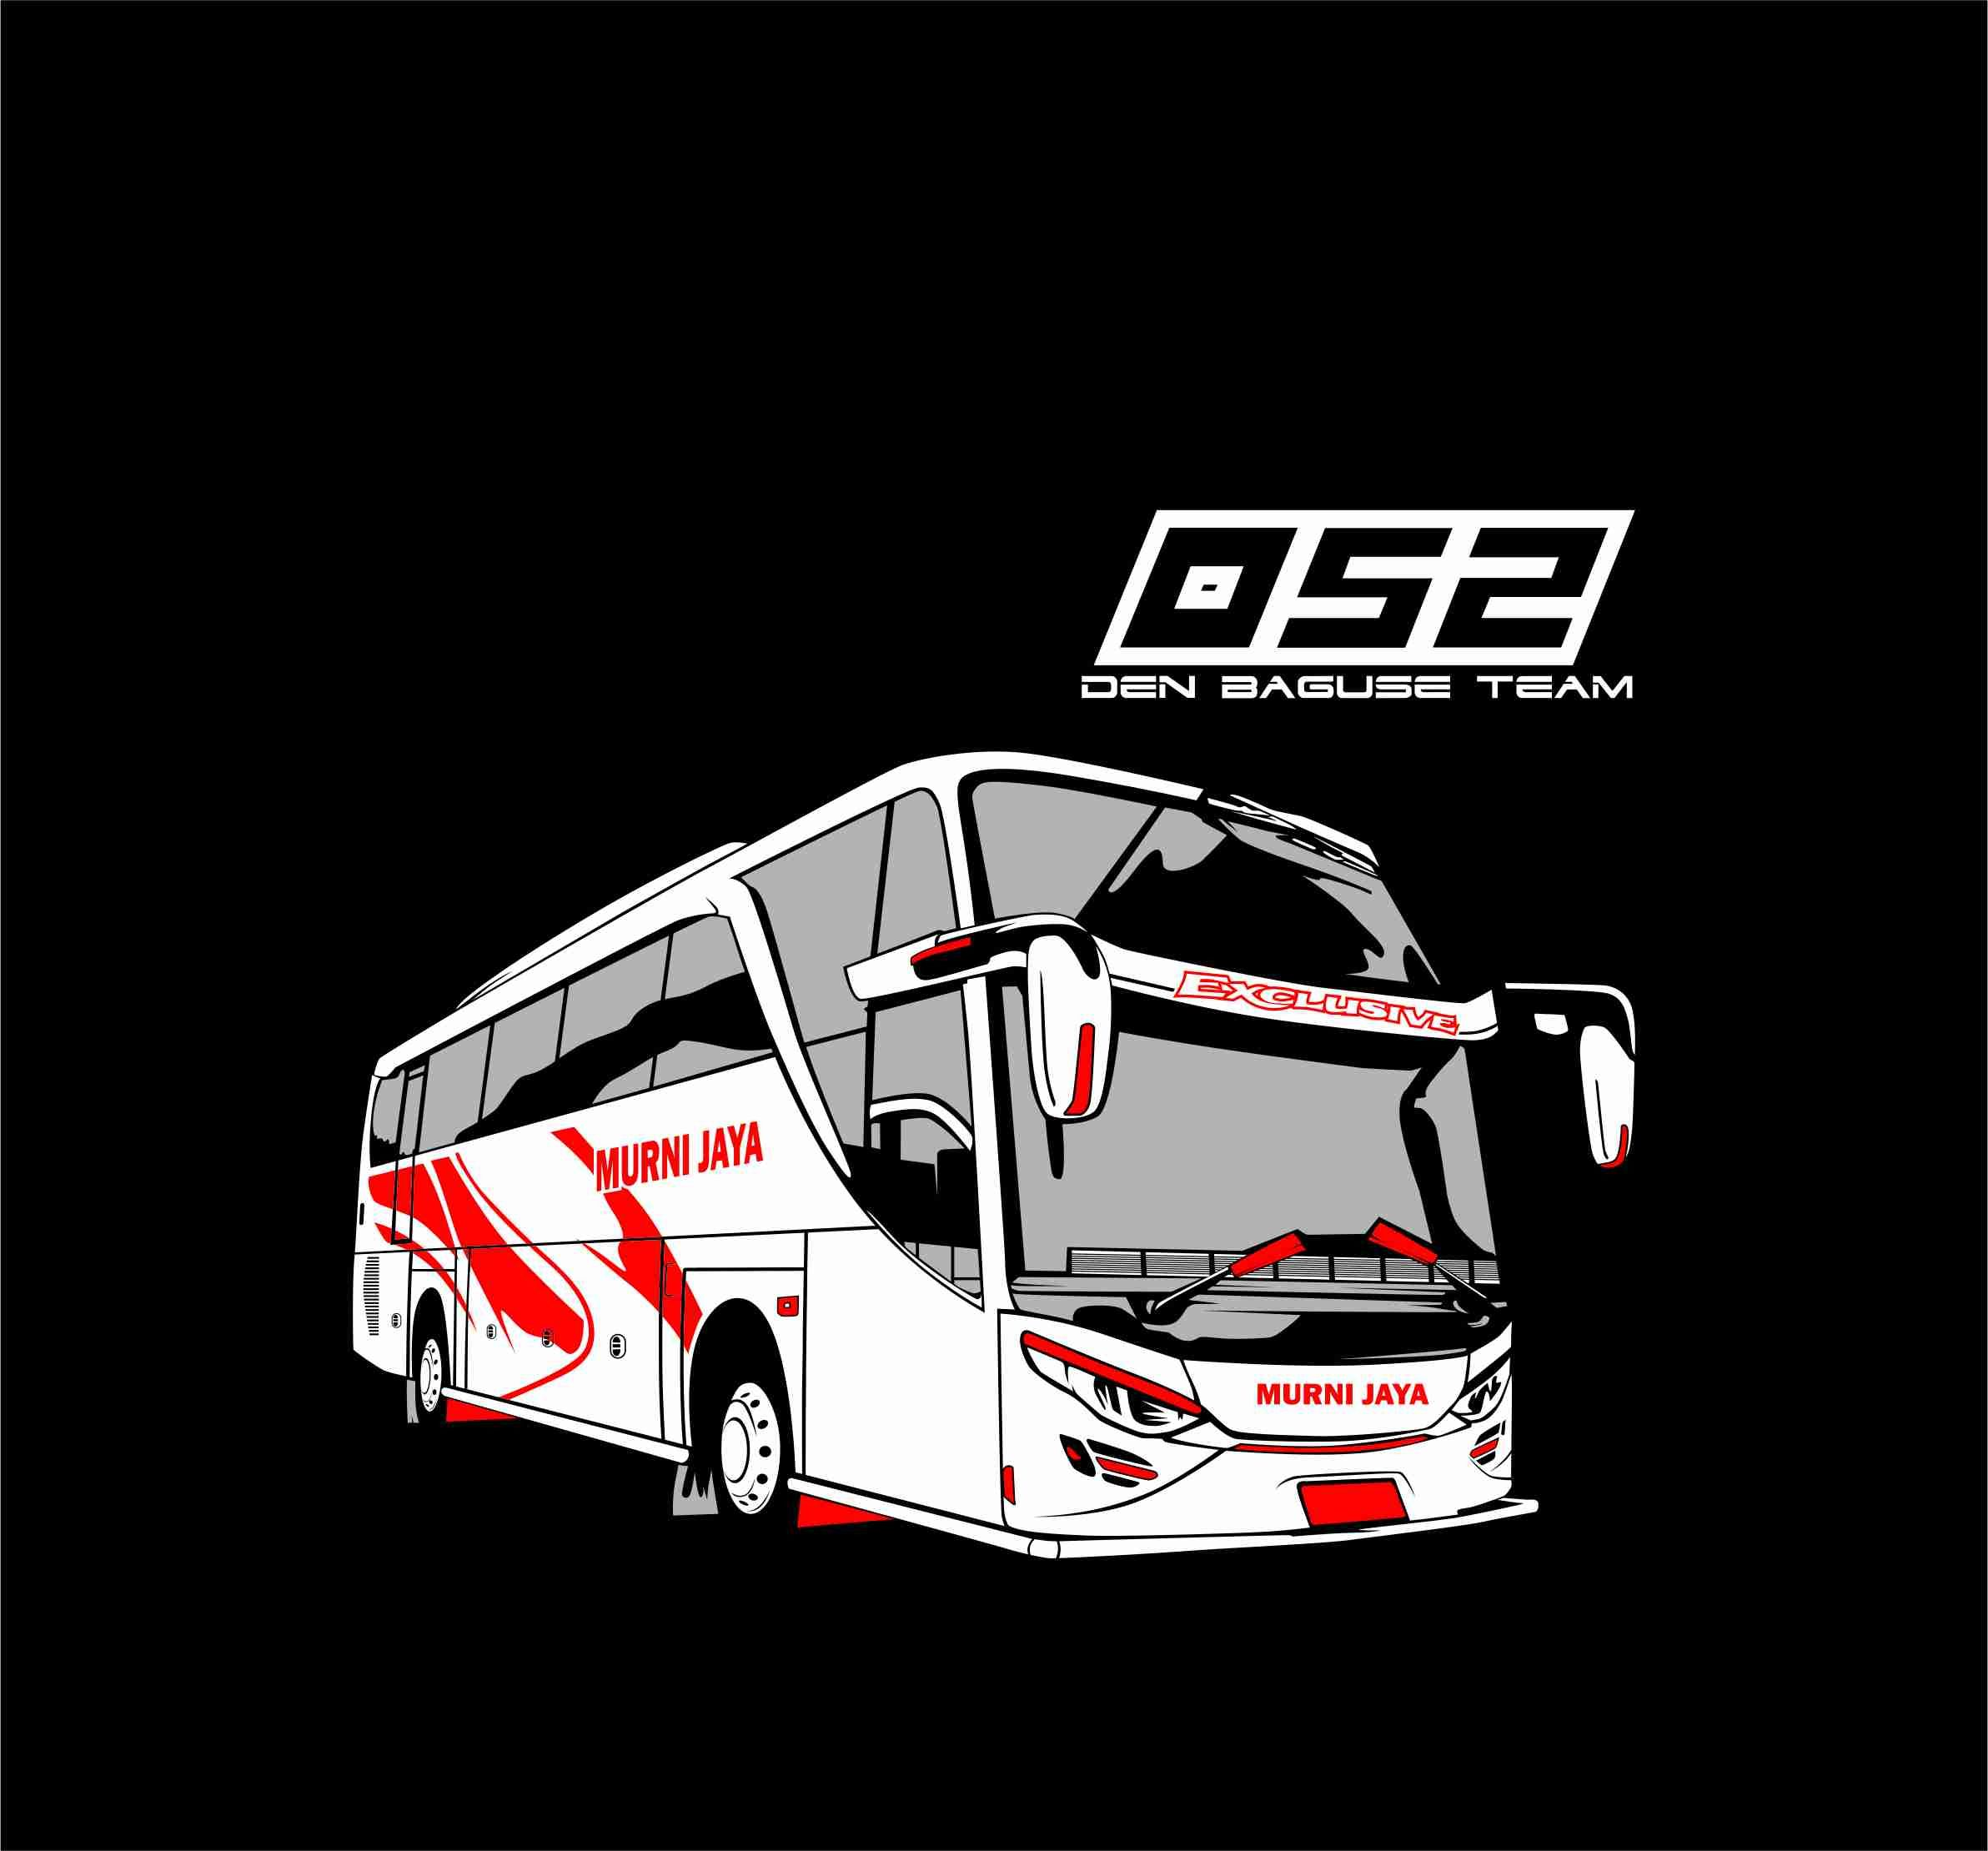 Bus Vector Desain Logo Otomotif Stiker Mobil Mobil